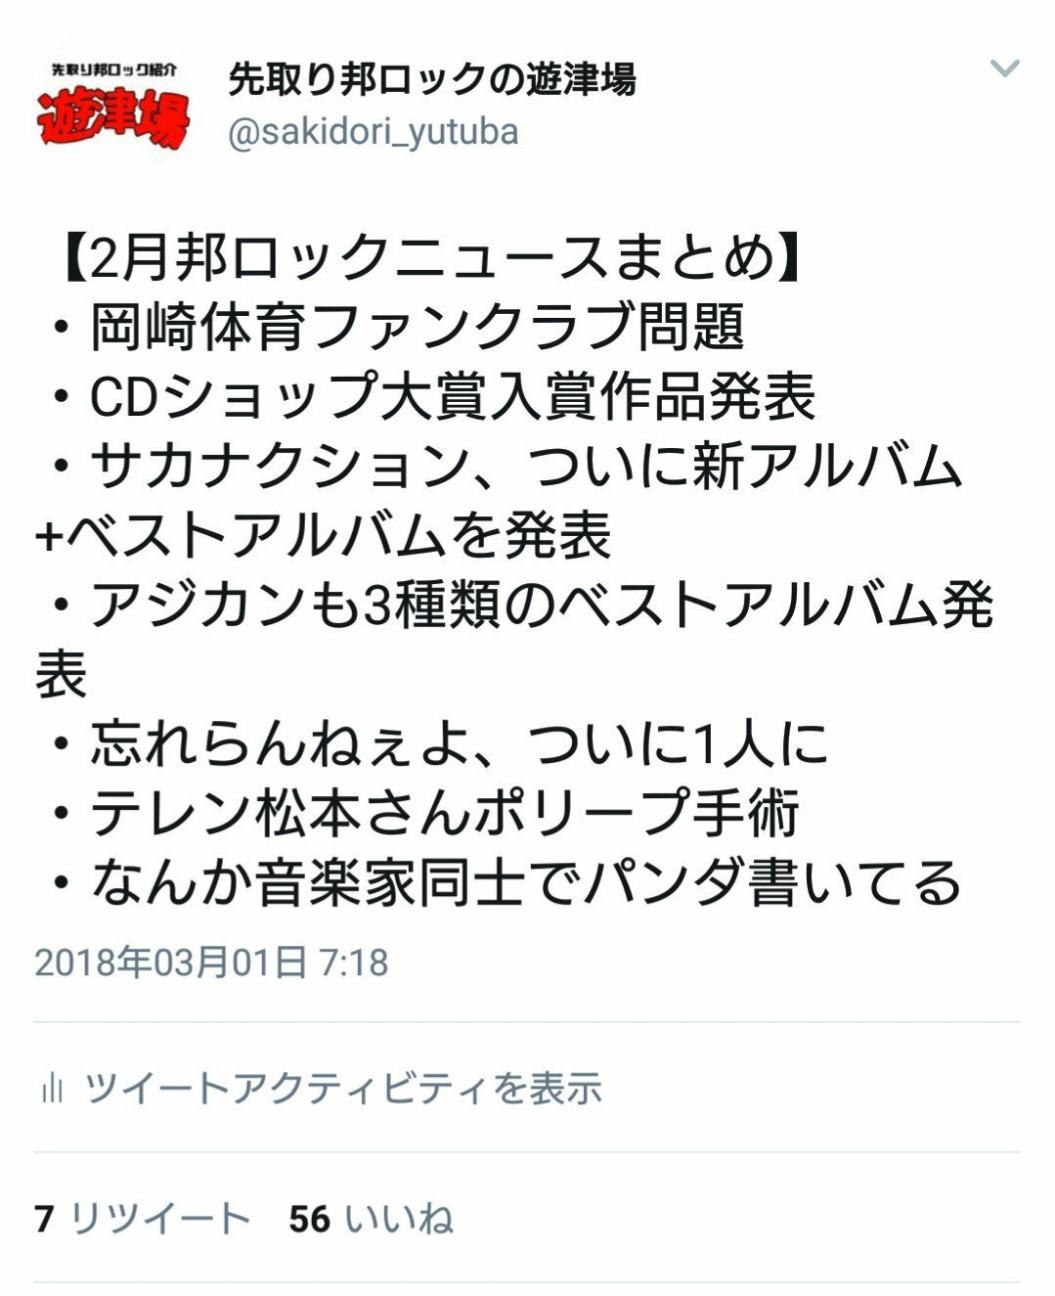 f:id:sakidoriyutsubarock:20181213223431j:plain